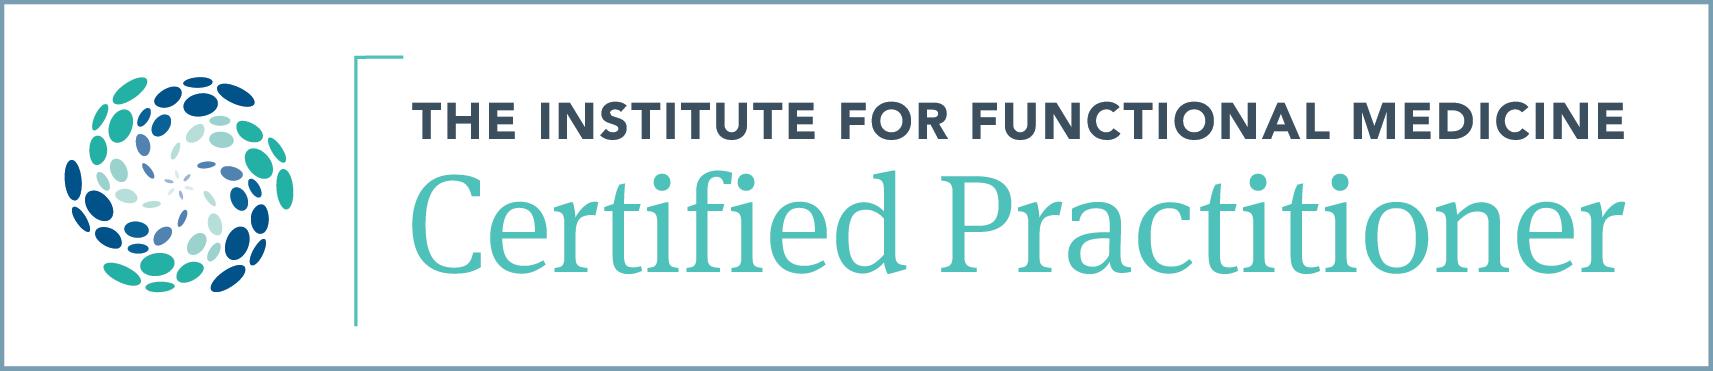 IFM certified functional medicine practitioner logo